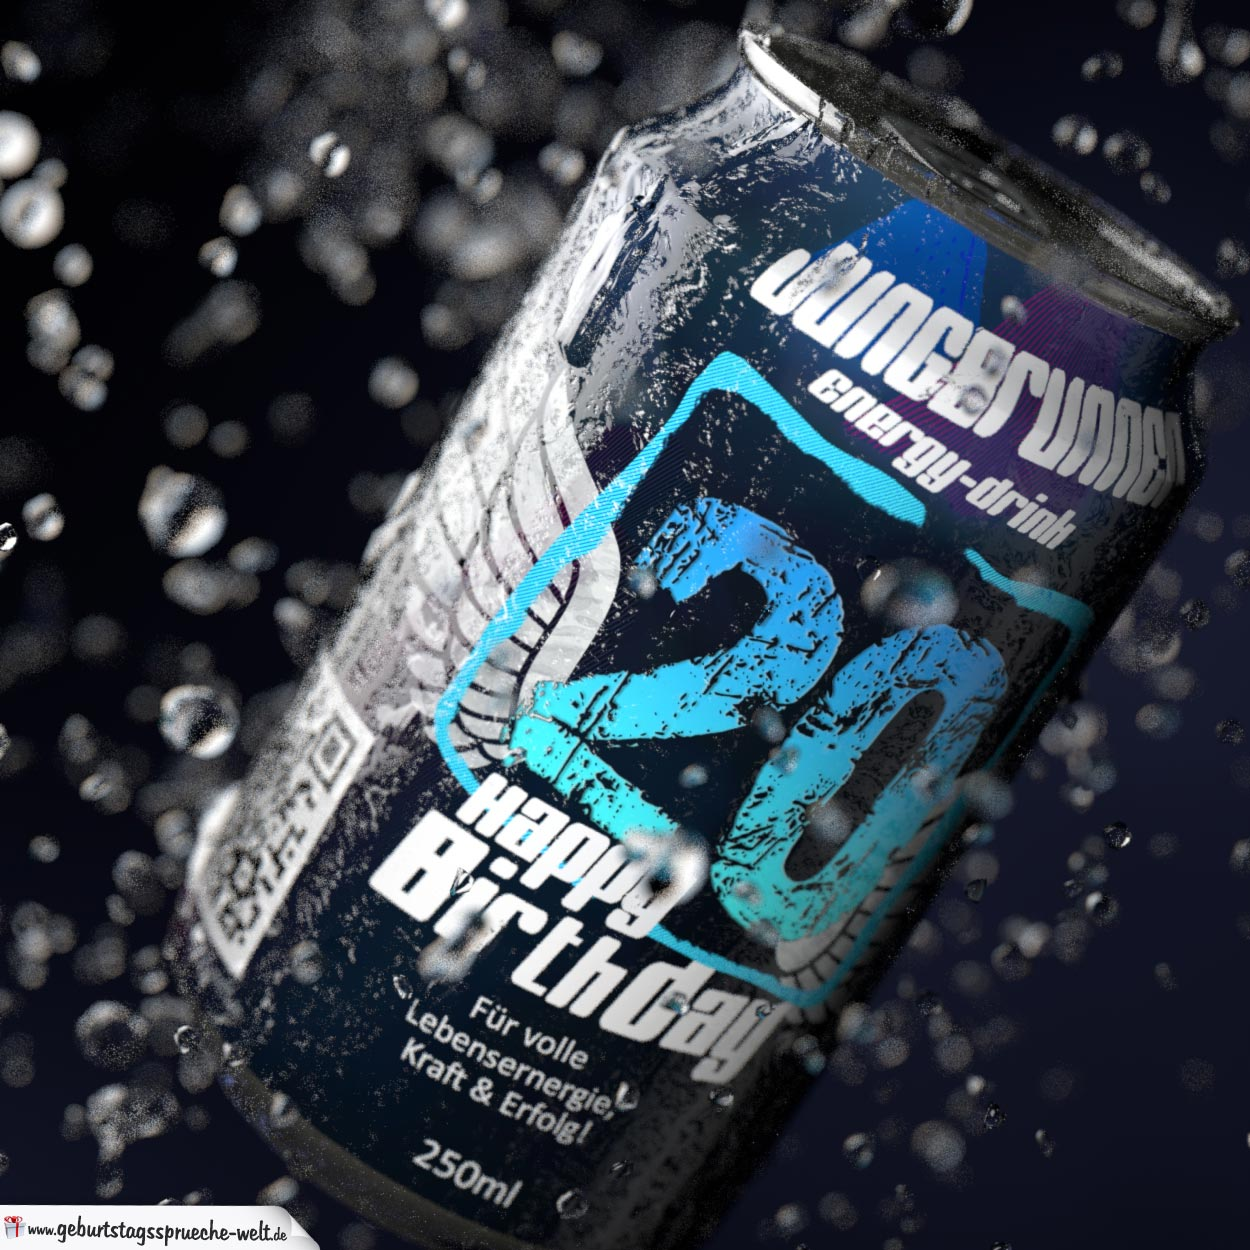 Coole Geburtstagskarte - Energy-Drink Getränkedose 20